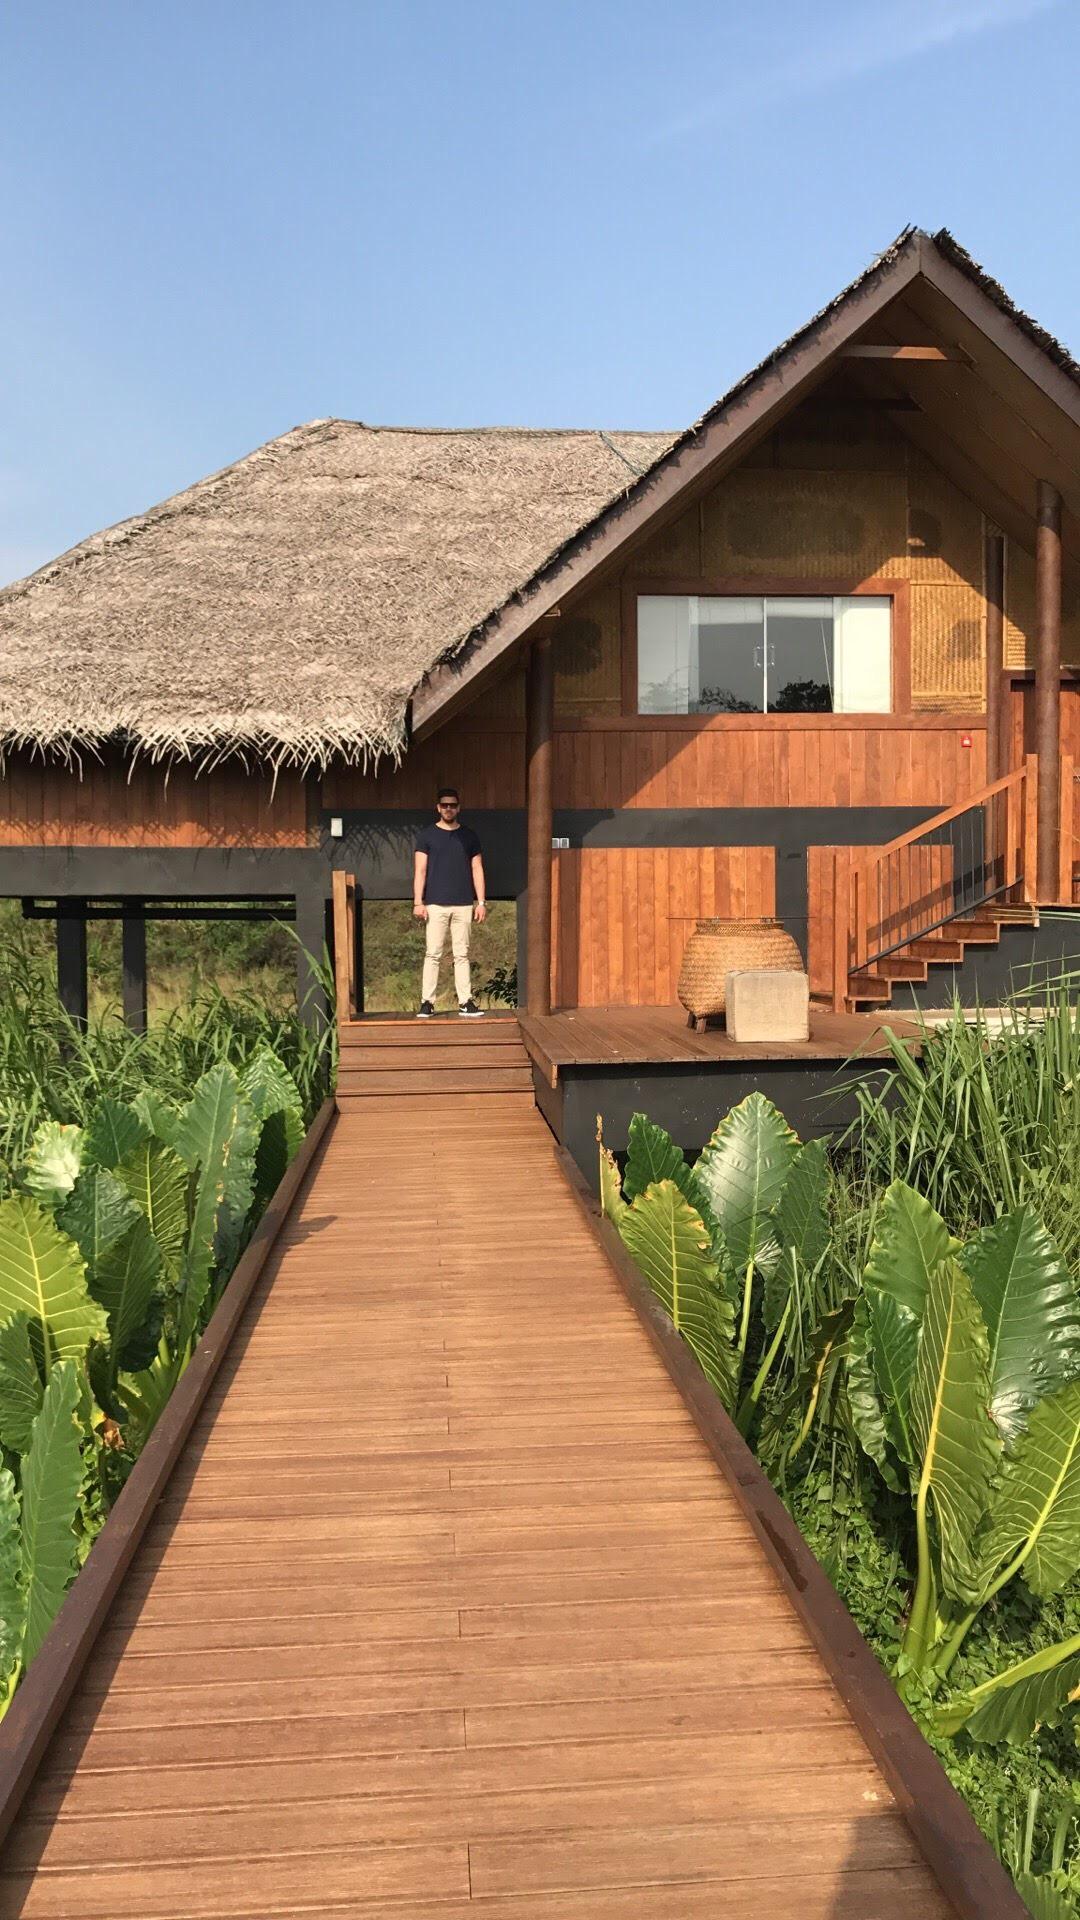 invite-to-paradise-maldives-sri-lanka-specialists-experts-travel-agent-tour-operator-customer-feedback-lucas-emily-fenning-elephant-orphanage-vil-uyana-room-1.jpg